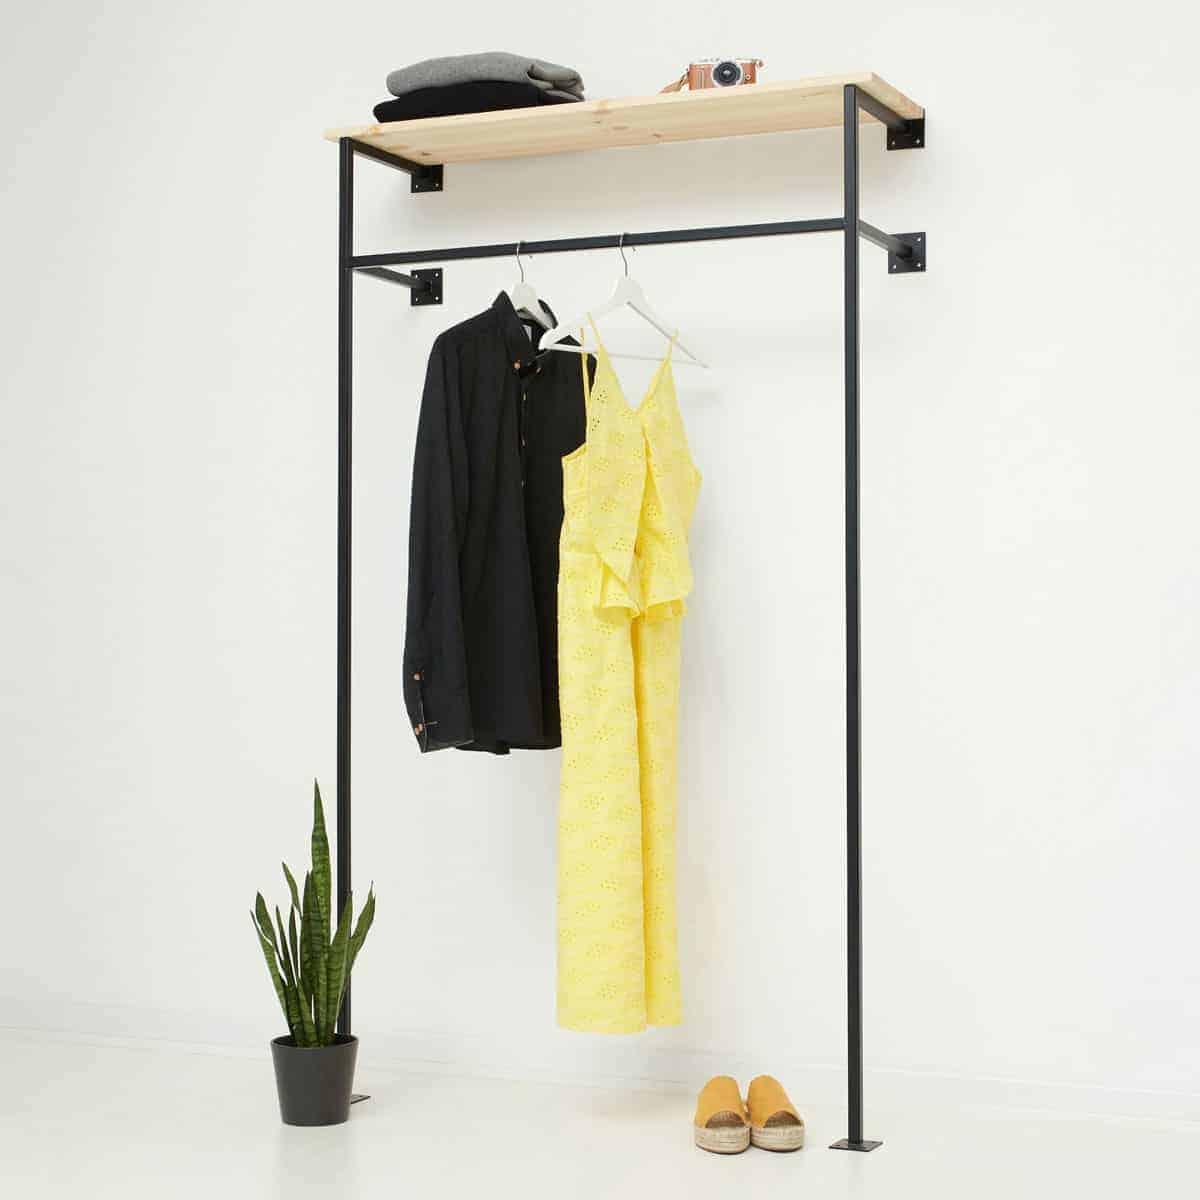 Offener Industrial Kleiderschrank Simple High Geschweisst Pulverbeschichtet